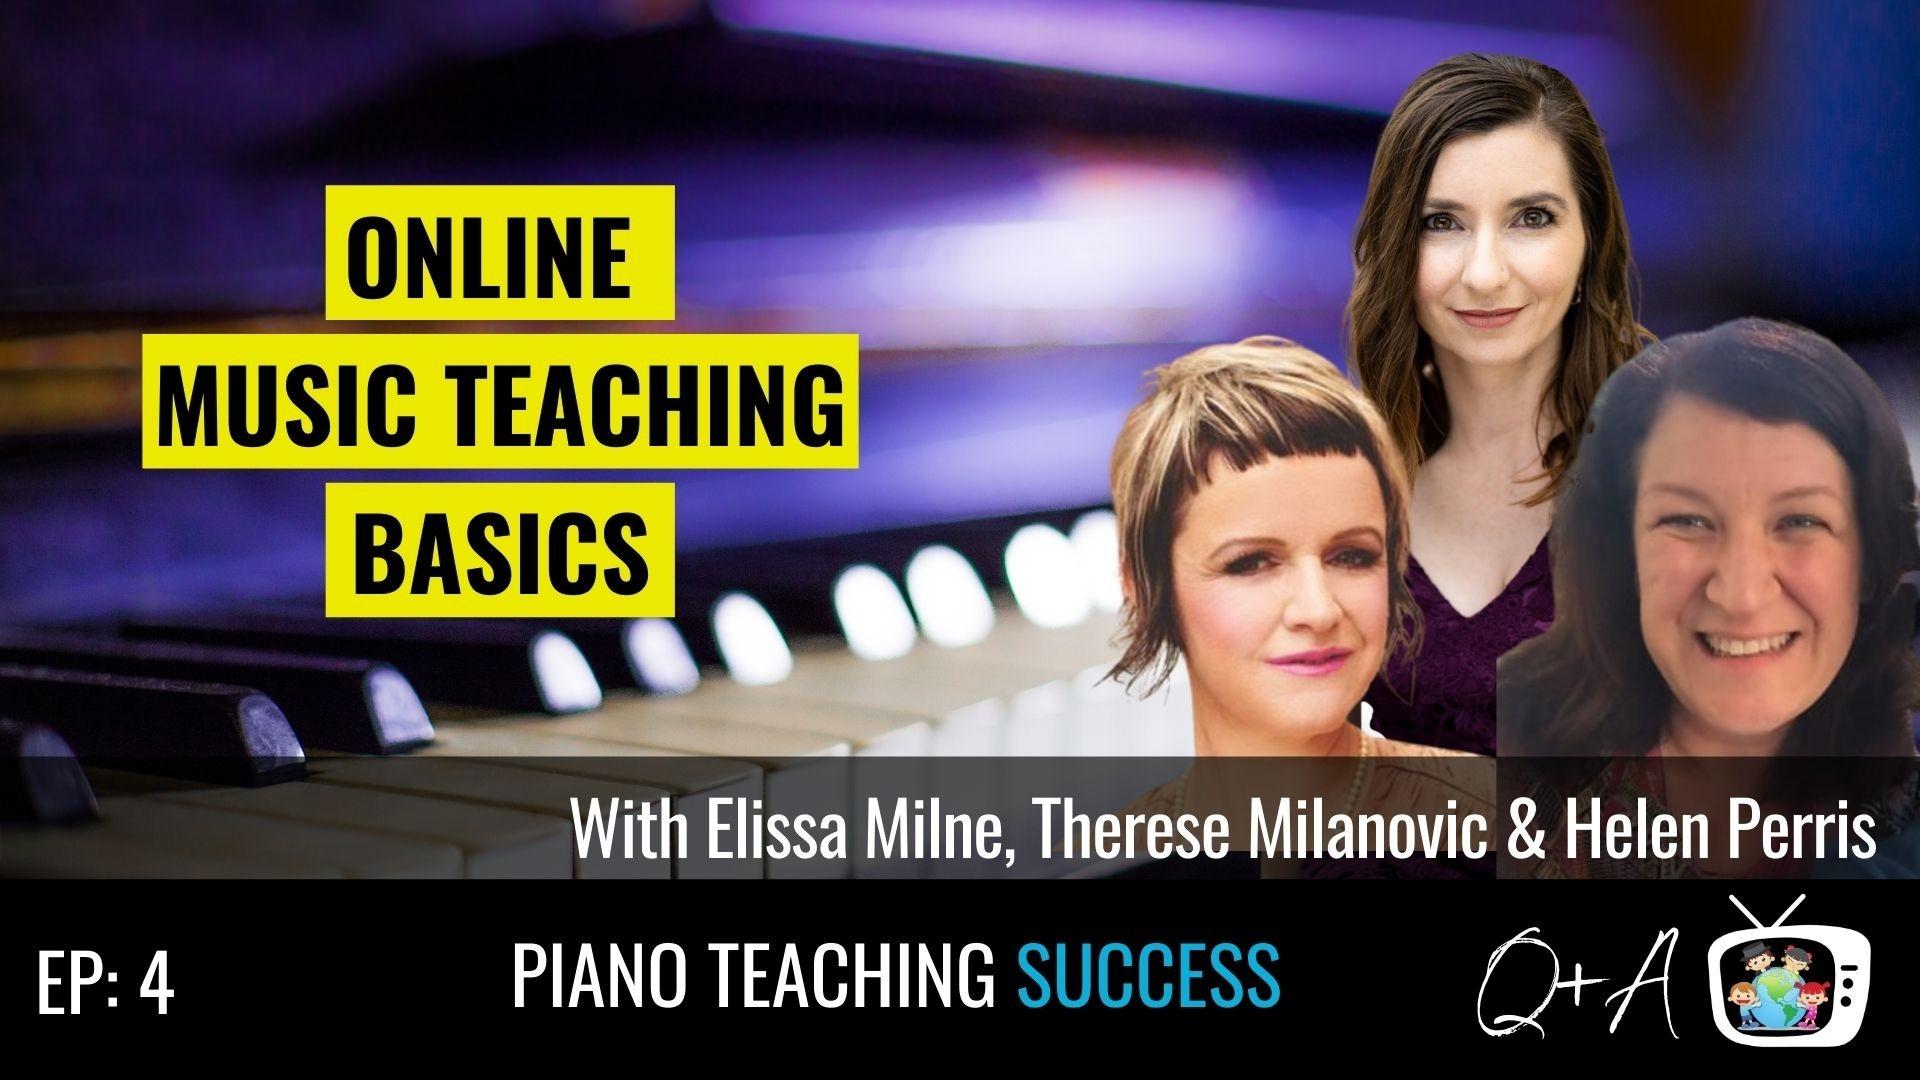 Elissa Milne, Therese Milanovic, Helen Perris